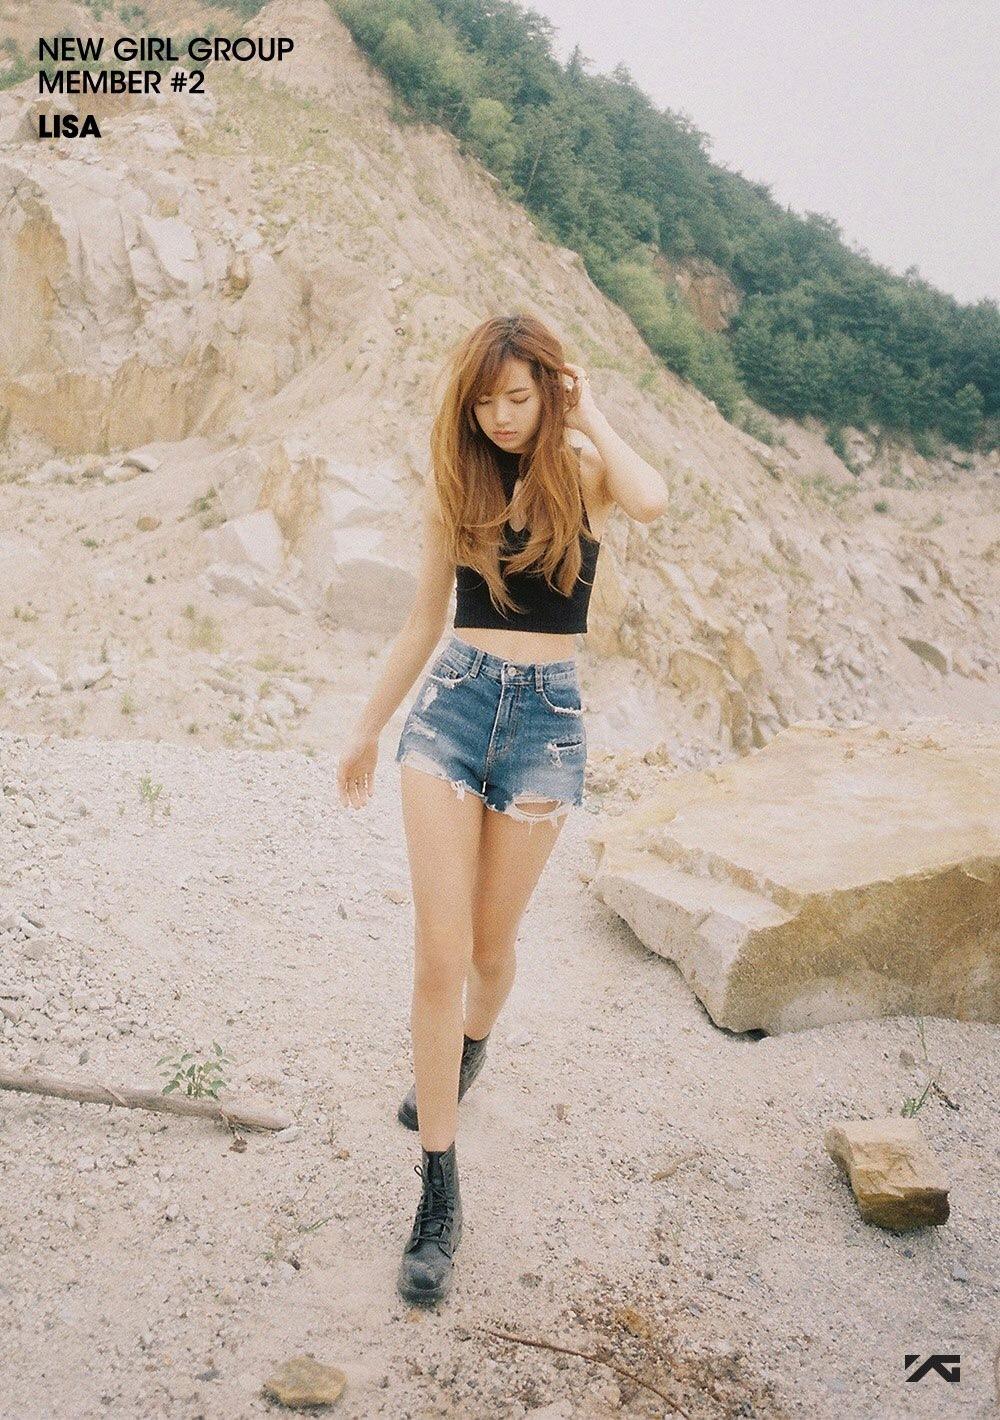 BLACK PINK | Member #2 - Lisa